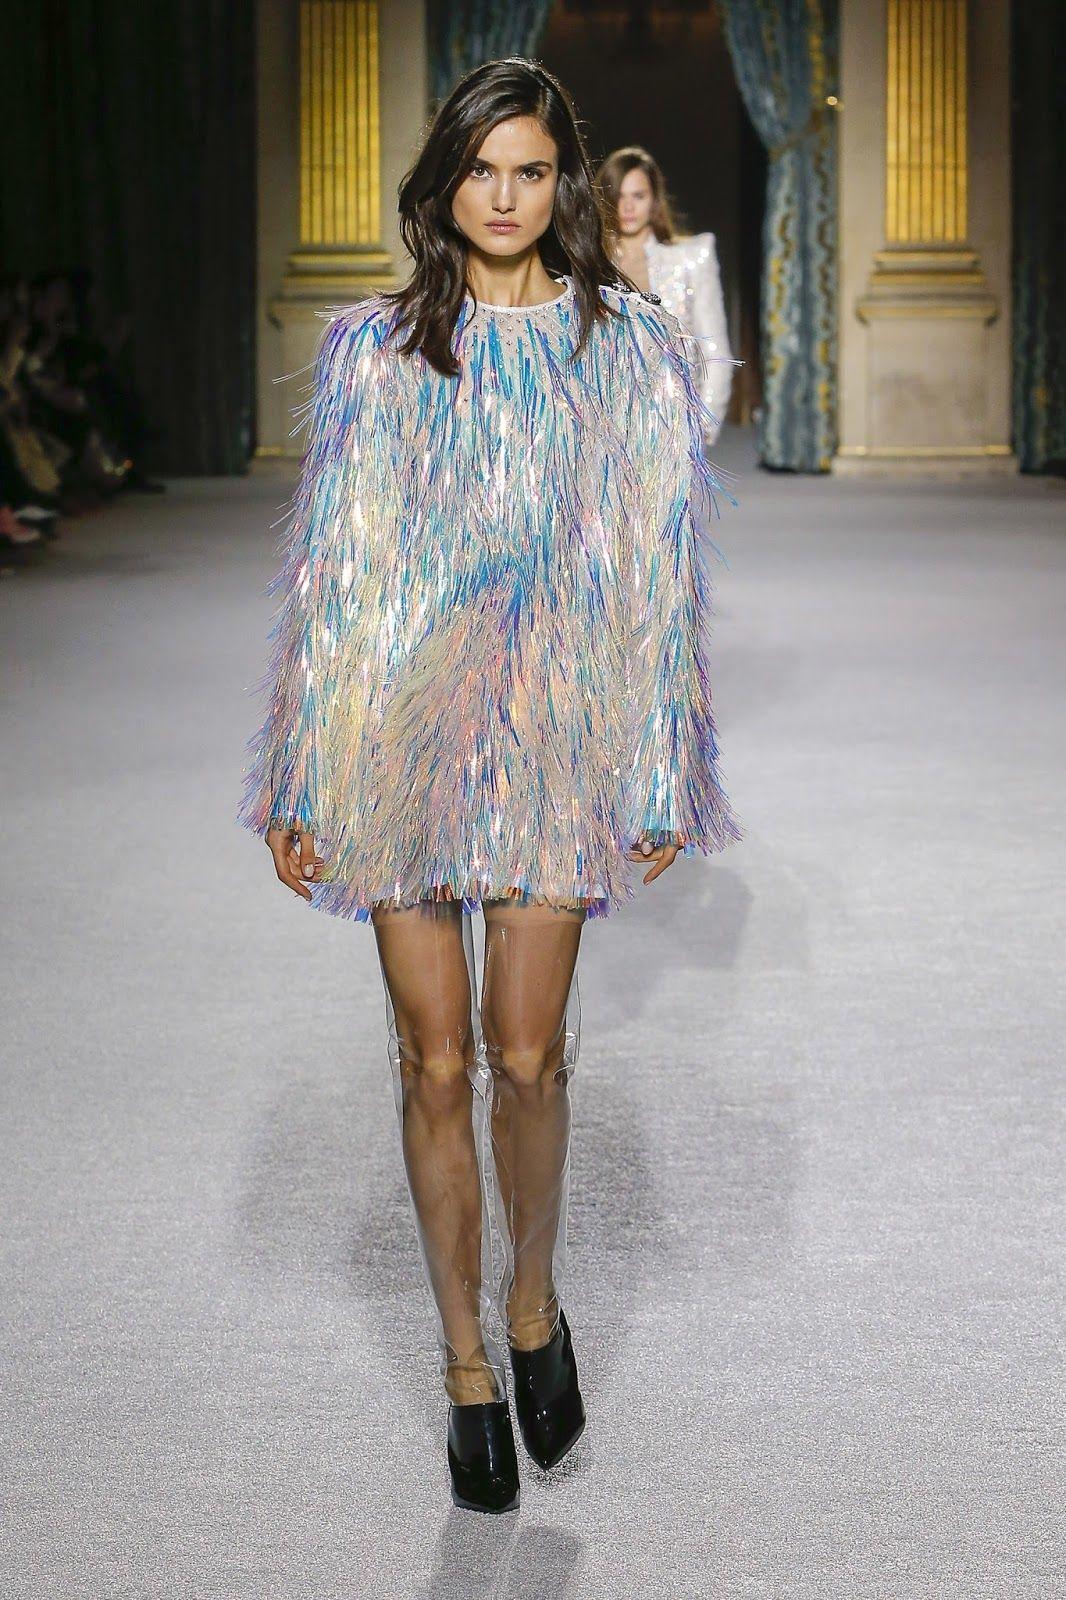 8a8b9187d7383 Destaques  Paris Fashion Week Fall 2018. Blamain, Blanca Padilla, vestido  com franjas de plástico holográficas, ankle boot preta